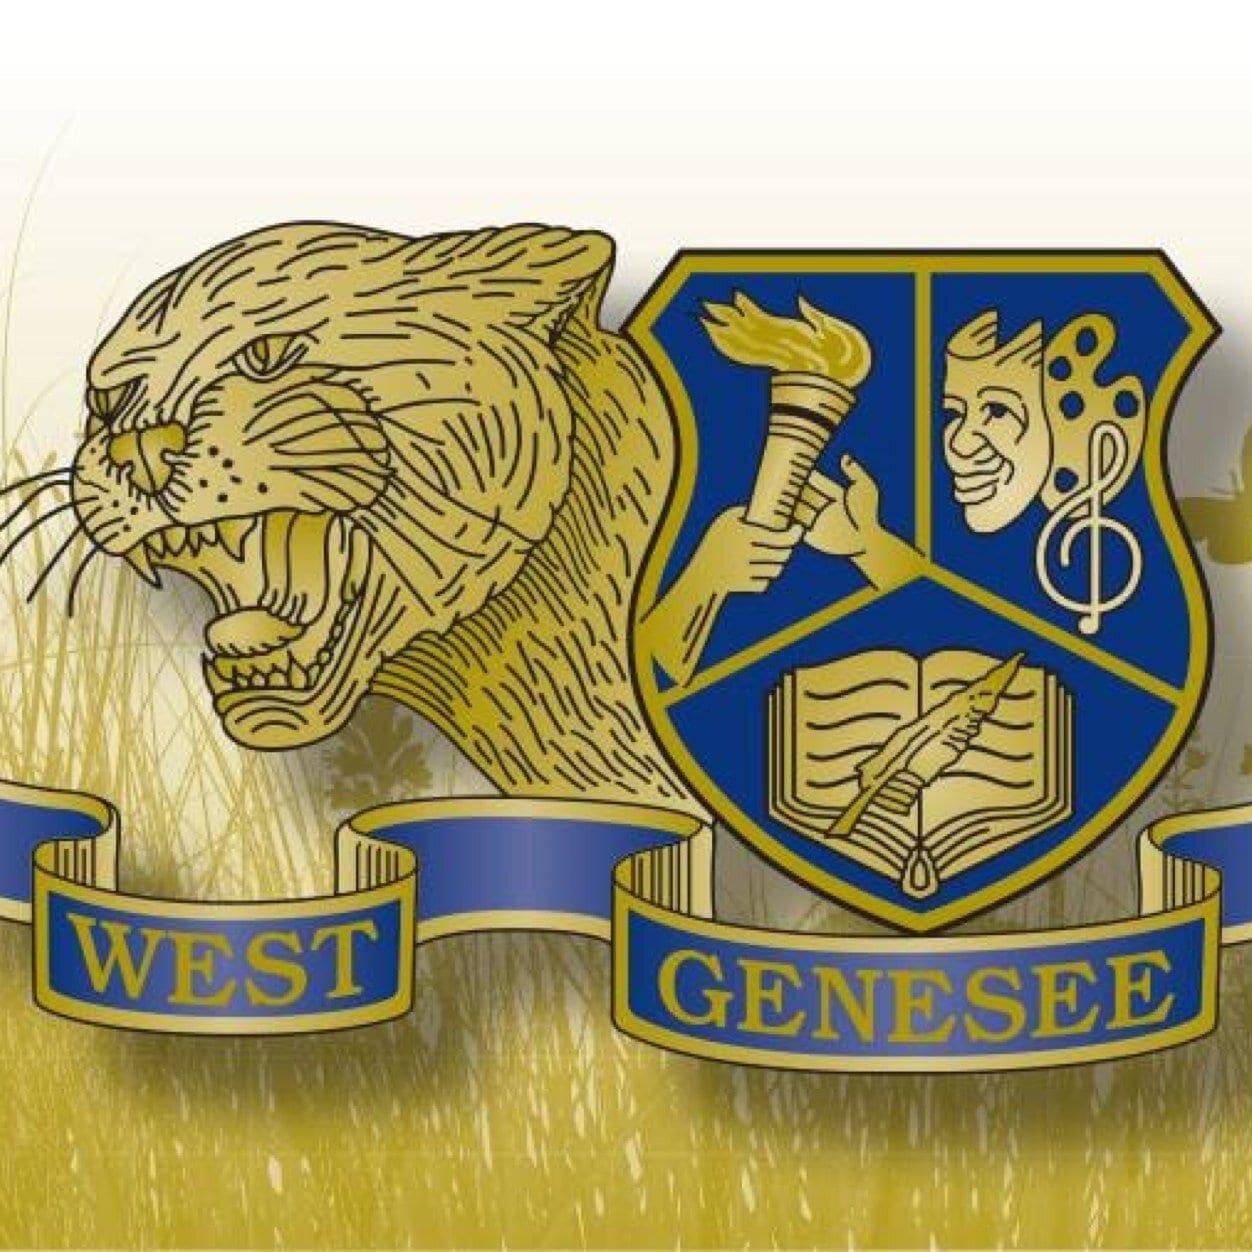 West Genesee High School evacuated following threat